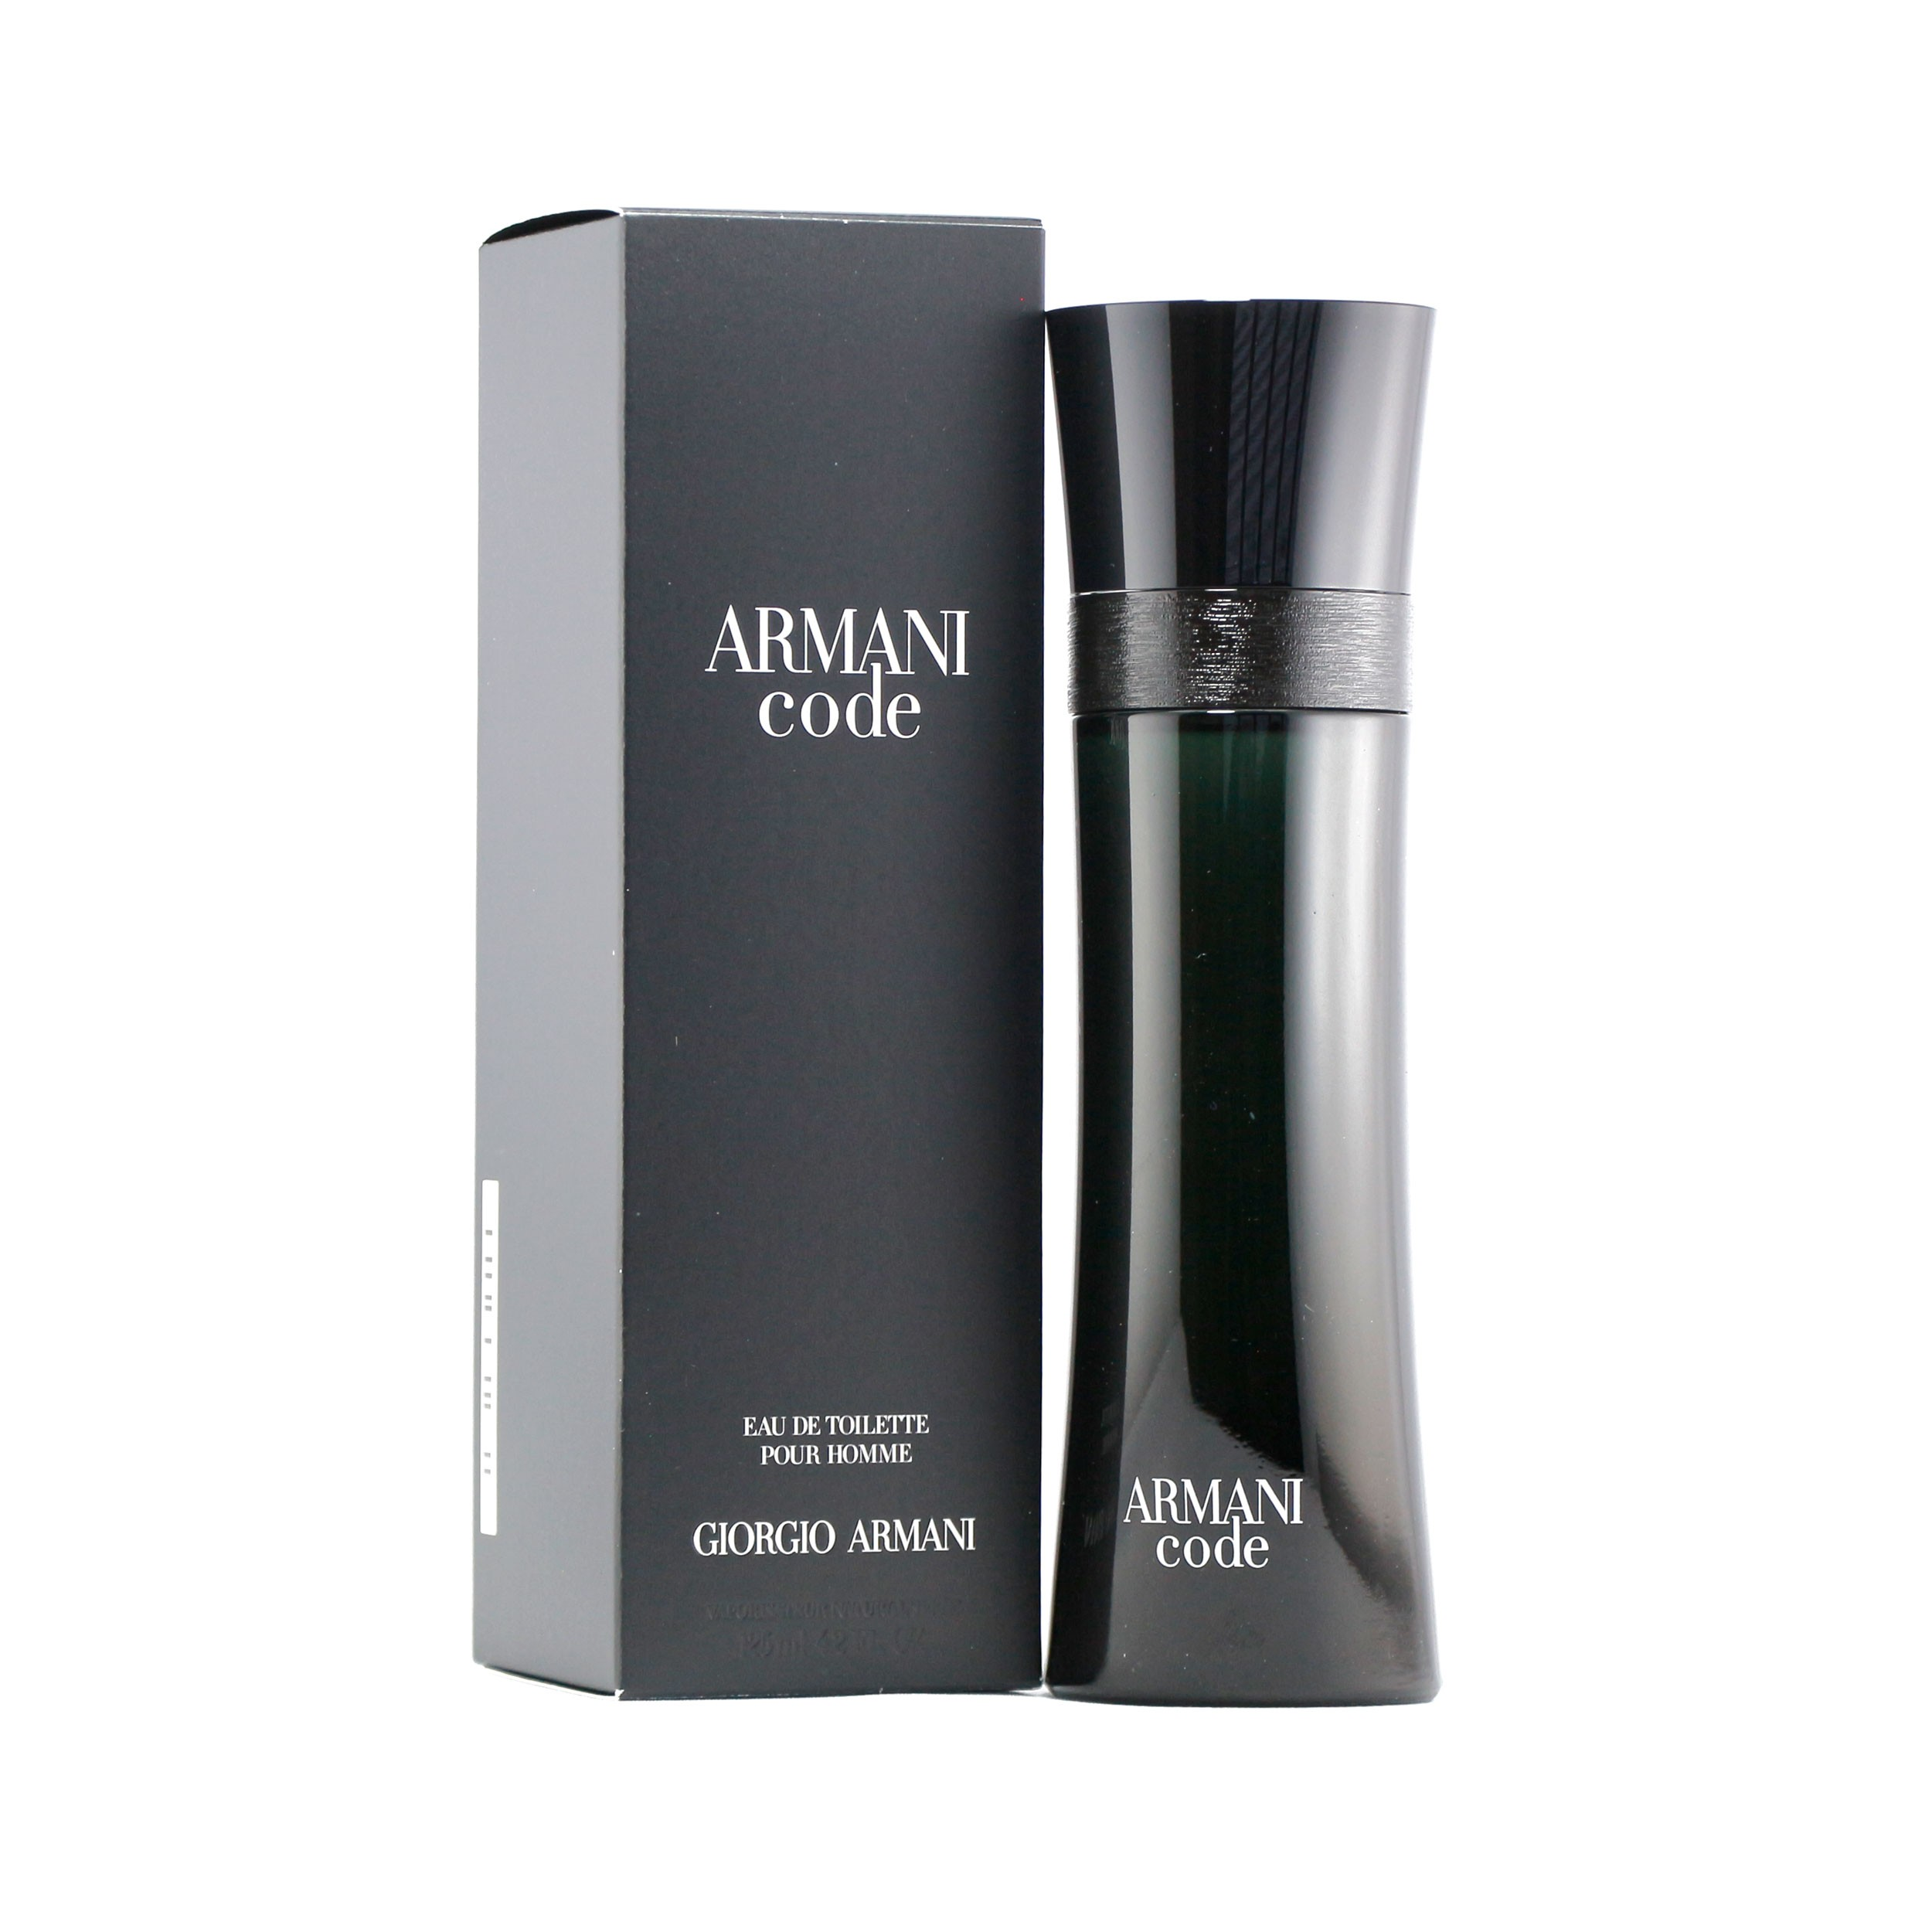 Giorgio Armani Armani Code Eau De Toilette Spray Beautypalastch